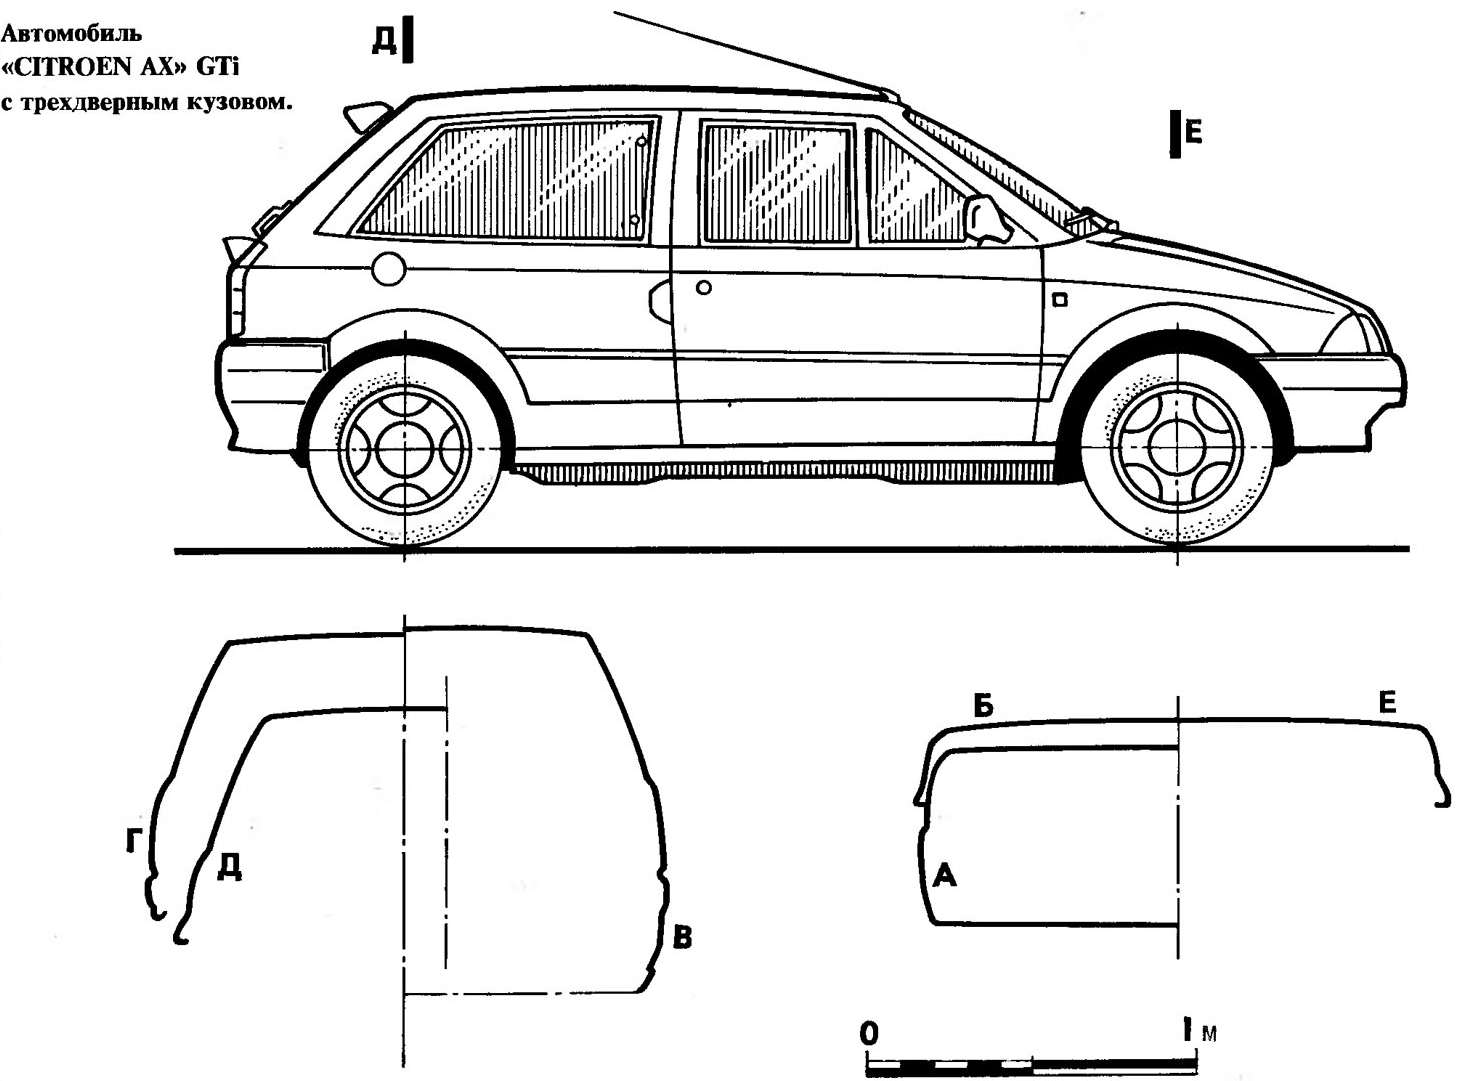 Citroen AX 14 GTi:picture # 1 , reviews, news, specs, buy car